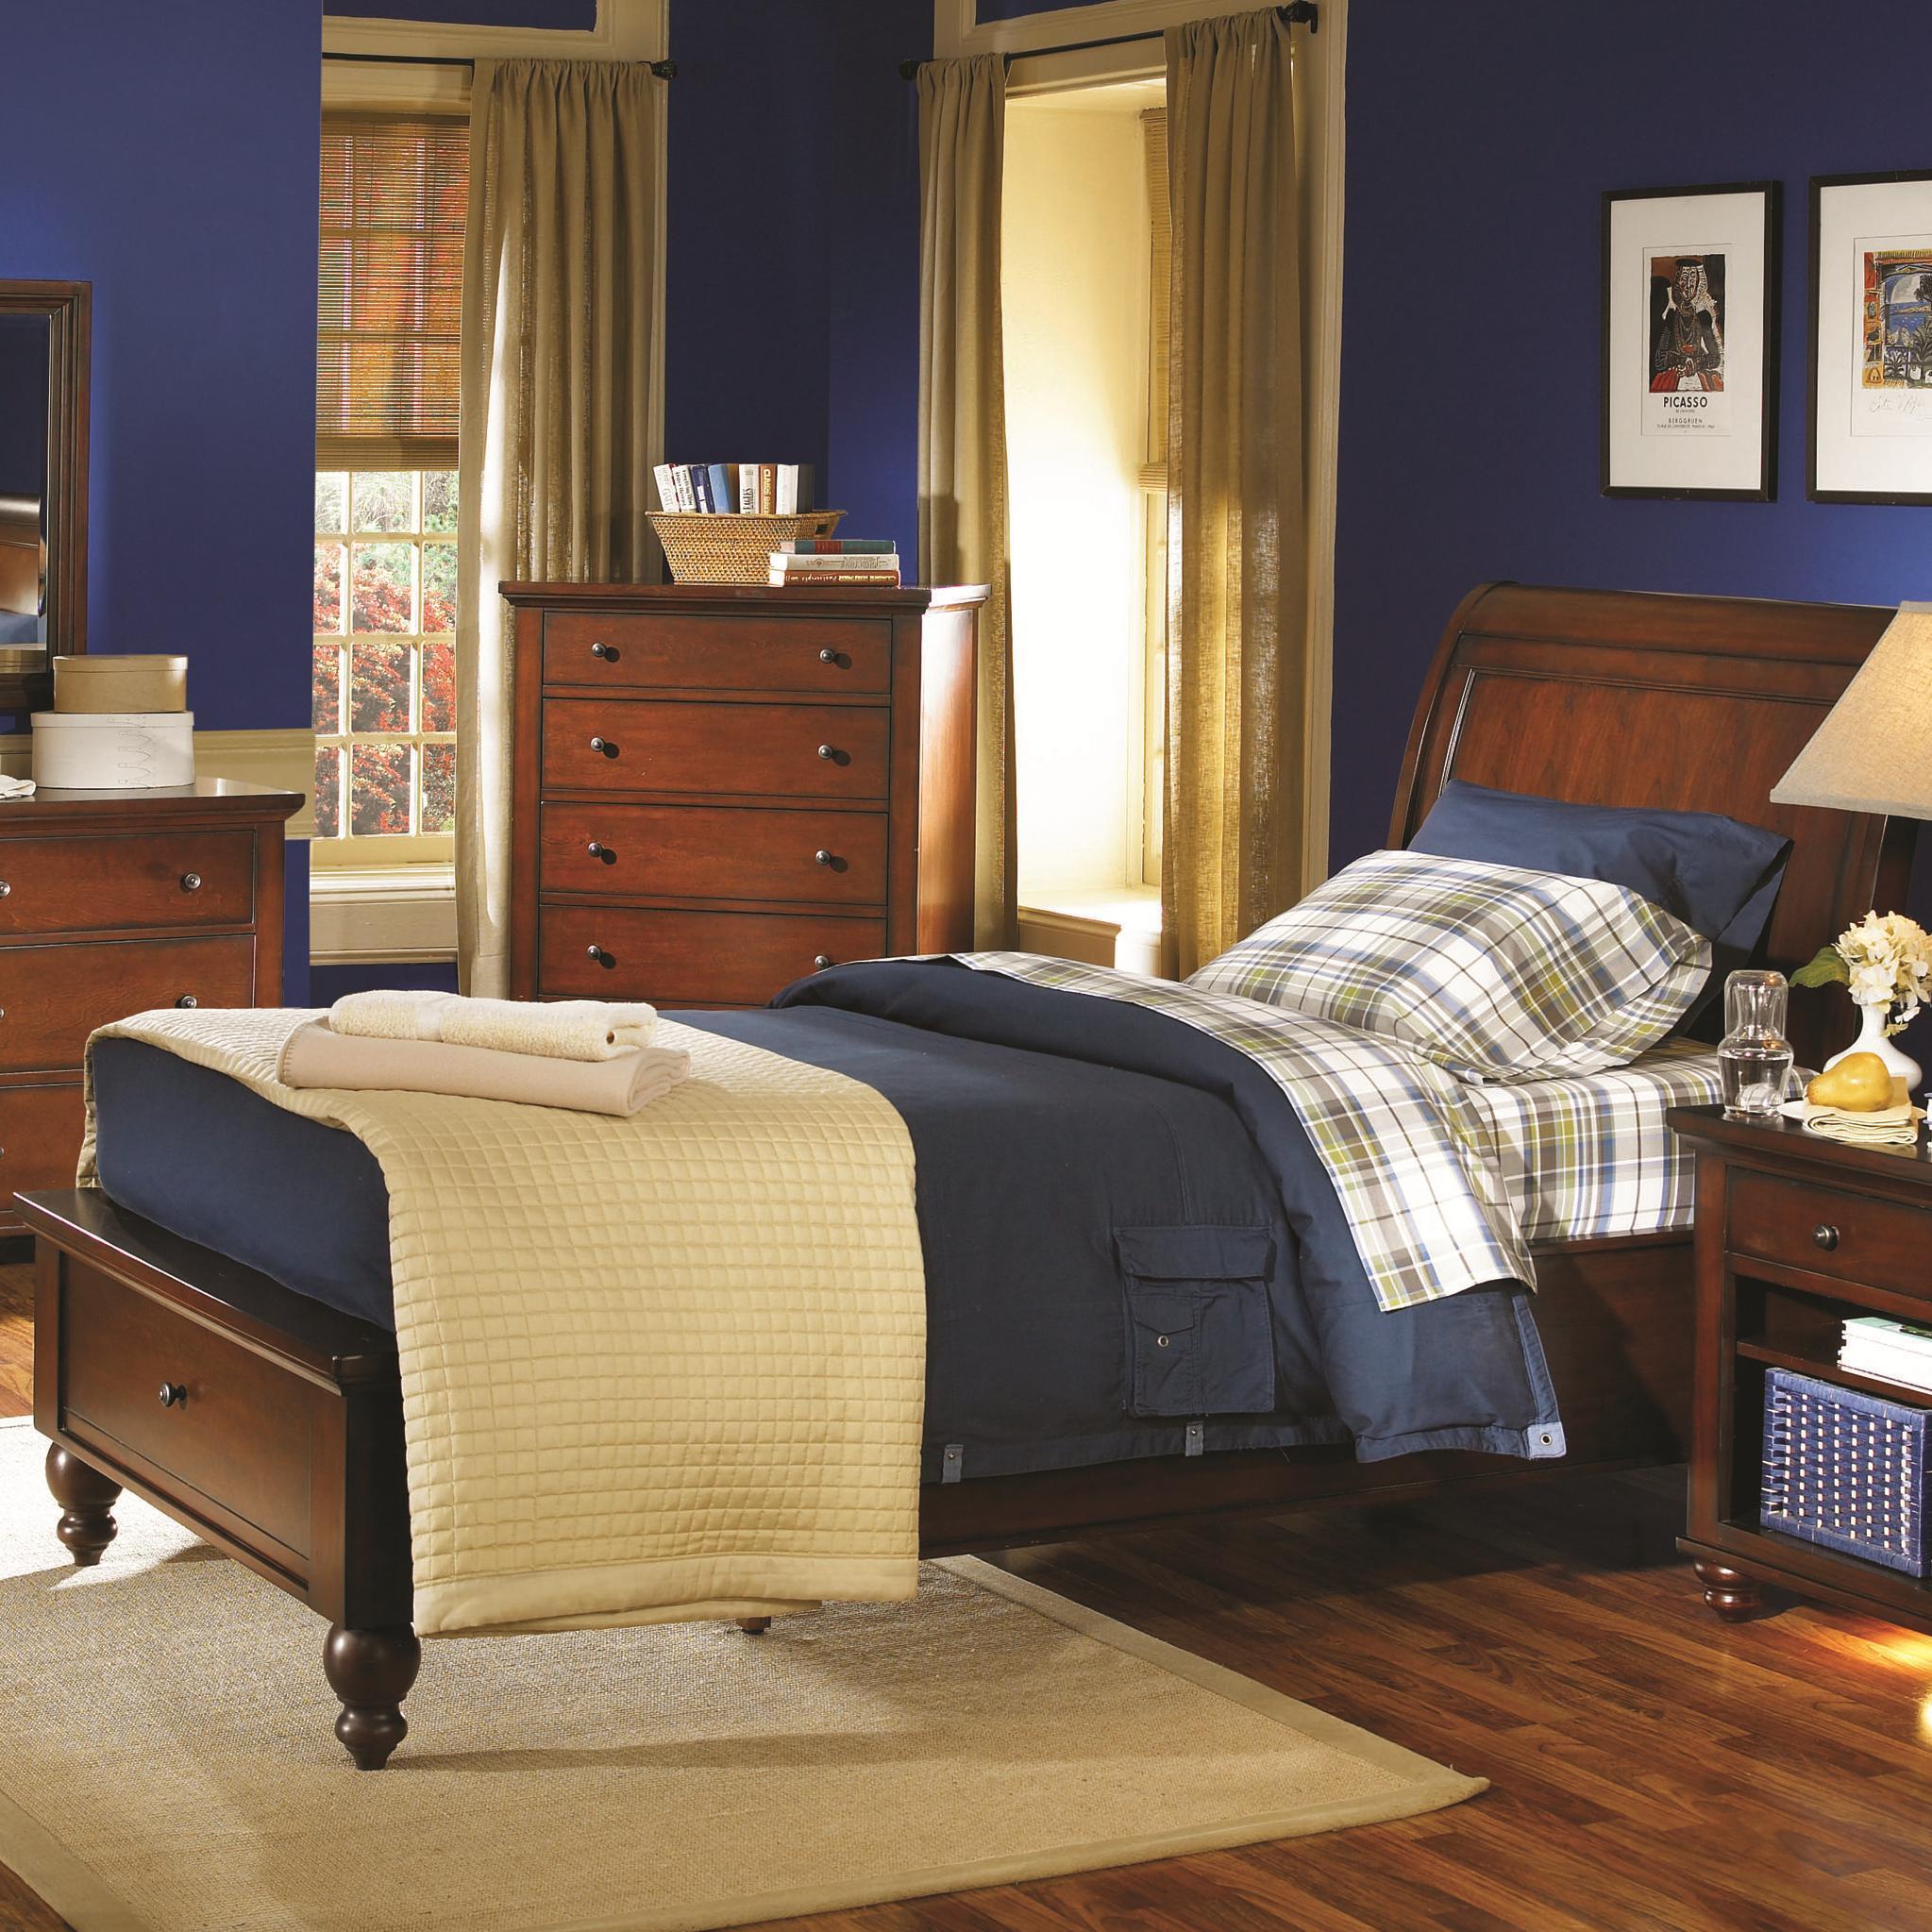 Home Bedroom Furniture Sleigh Beds Aspenhome Cambridge Twin Storage Sleigh  Bed. Aspenhome CambridgeTwin Storage Sleigh Bed